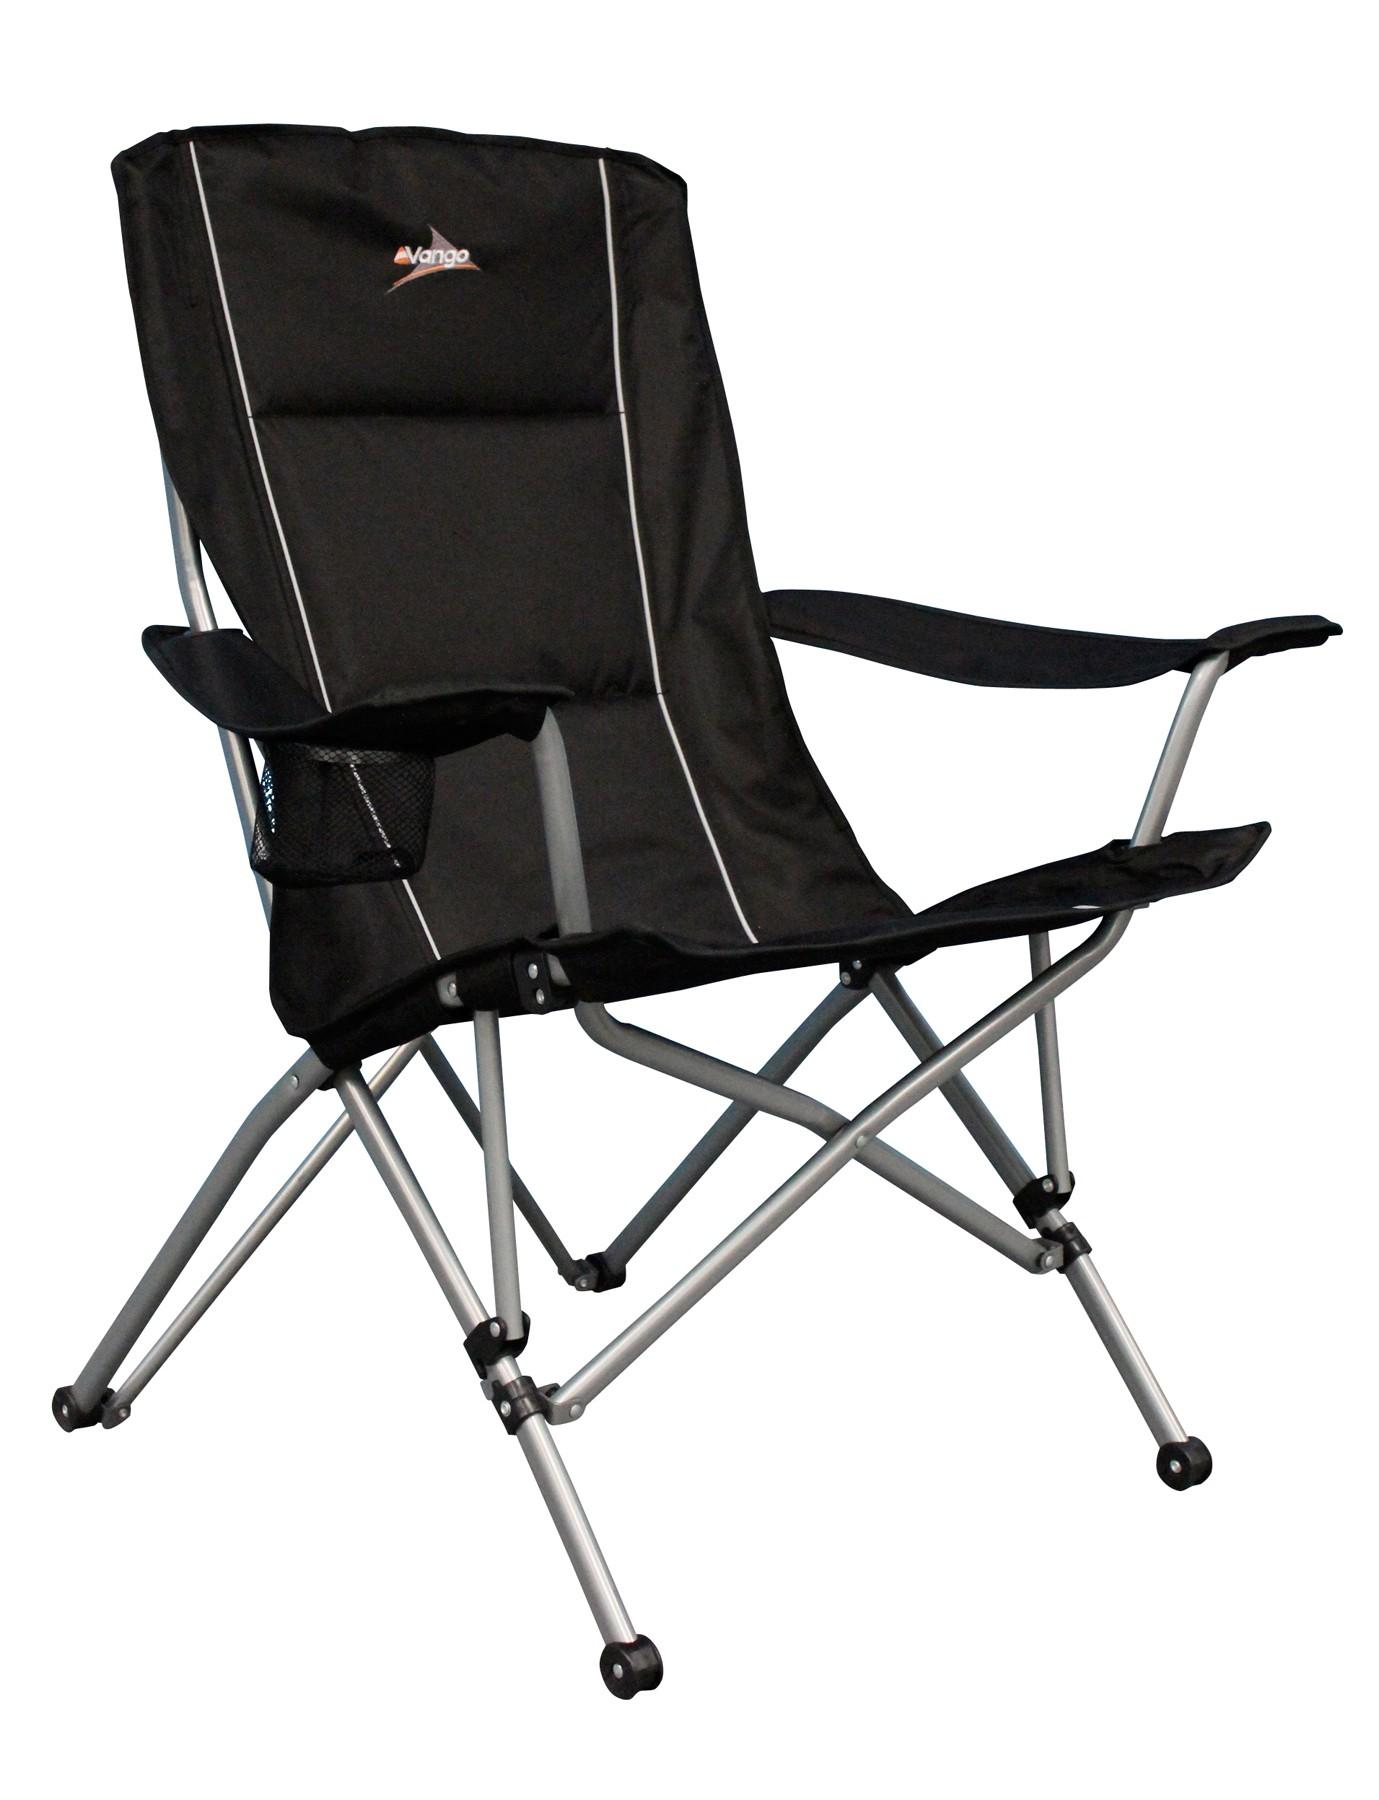 Vango Carmel Padded Steel Arm Chair Folding Camp Chairs